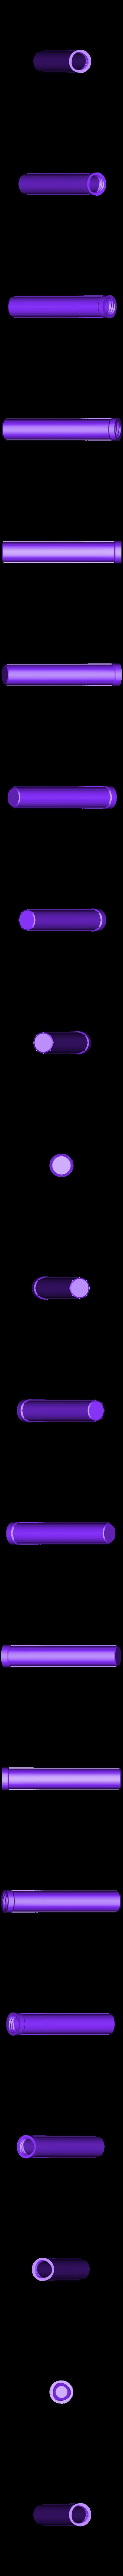 BatterySlot_Body_20.0mm.stl Download free STL file Bike Handlebar AA Battery Slot • 3D printable model, CyberCyclist